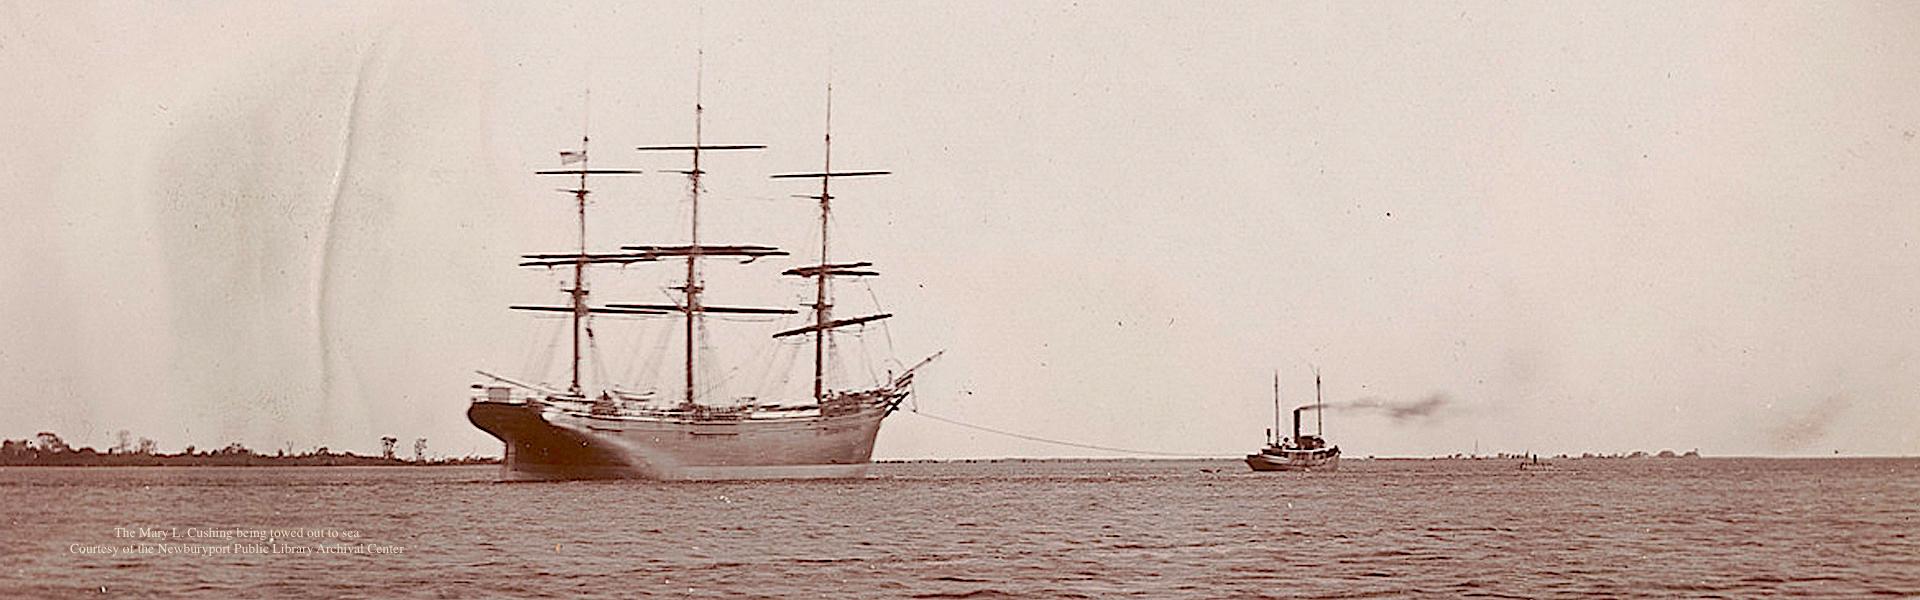 The John Currier Ship Being Towed Newburyport MA